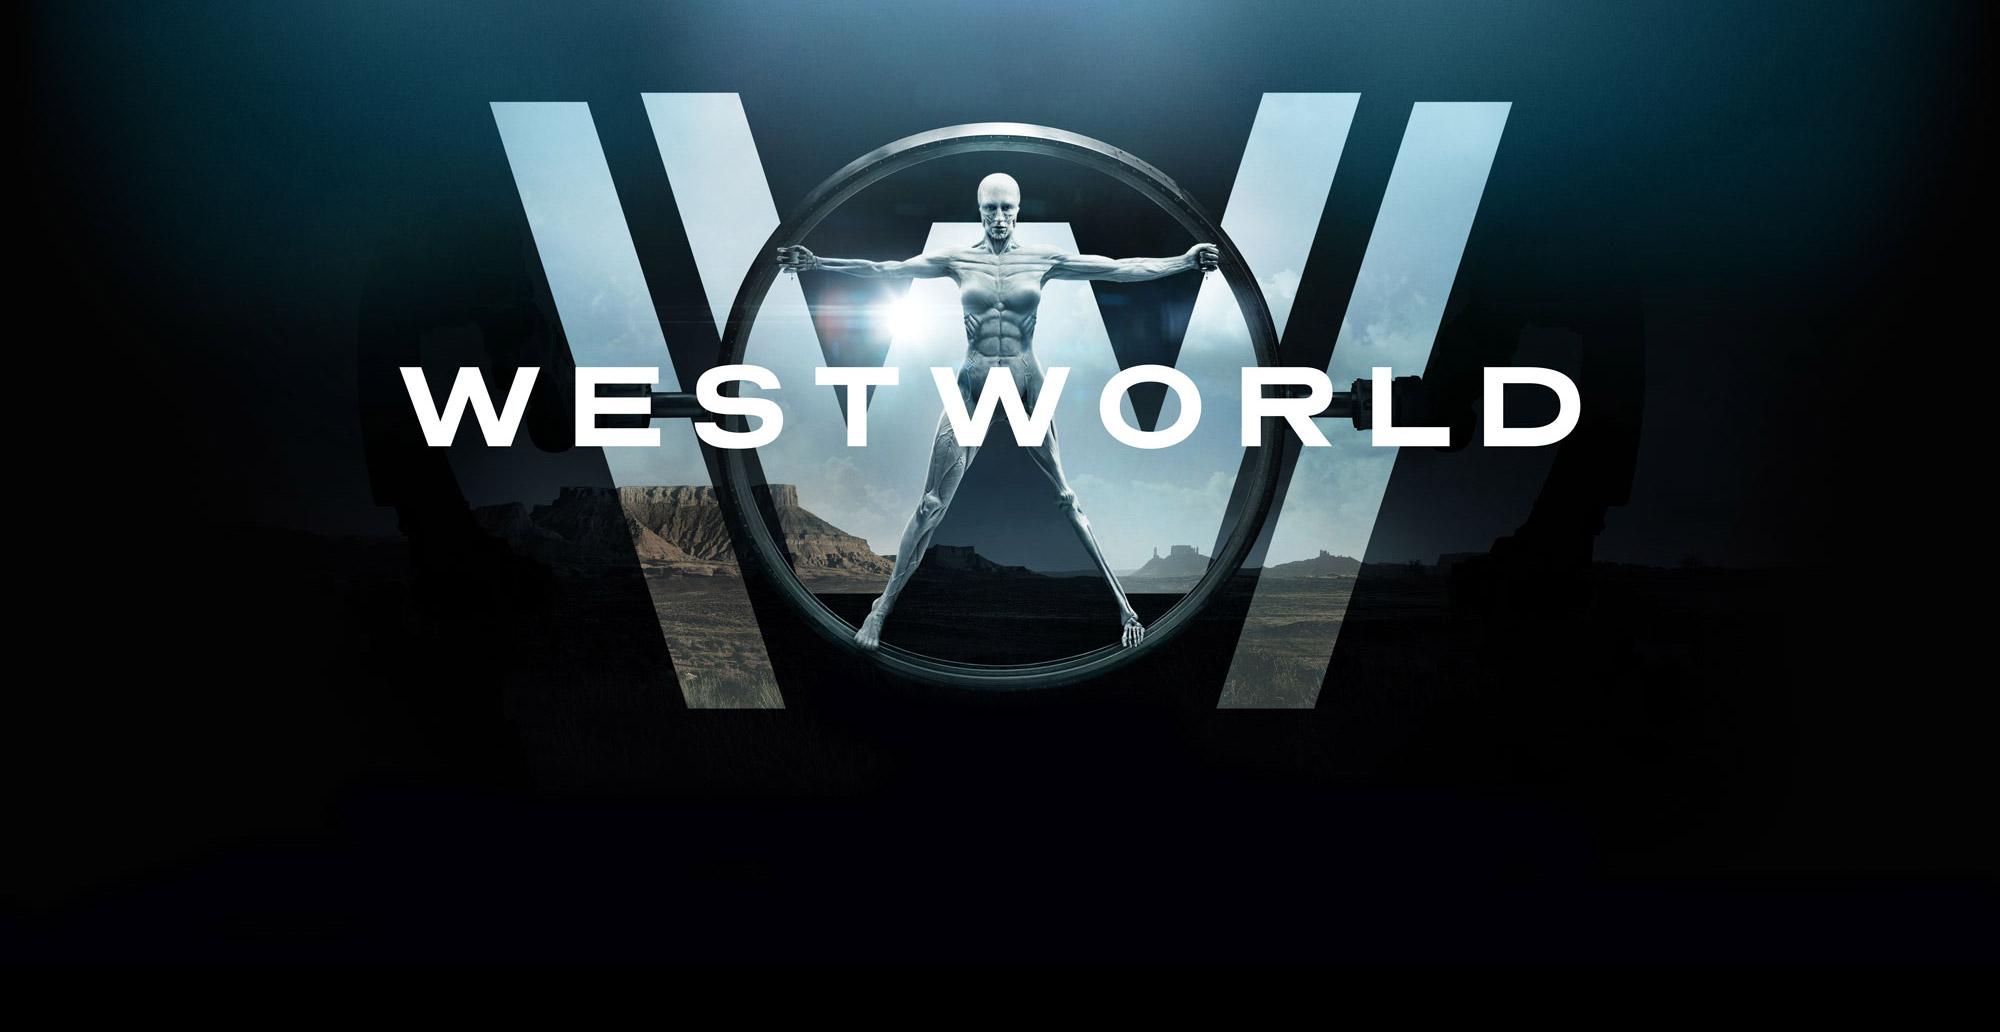 westworld-overlay-a